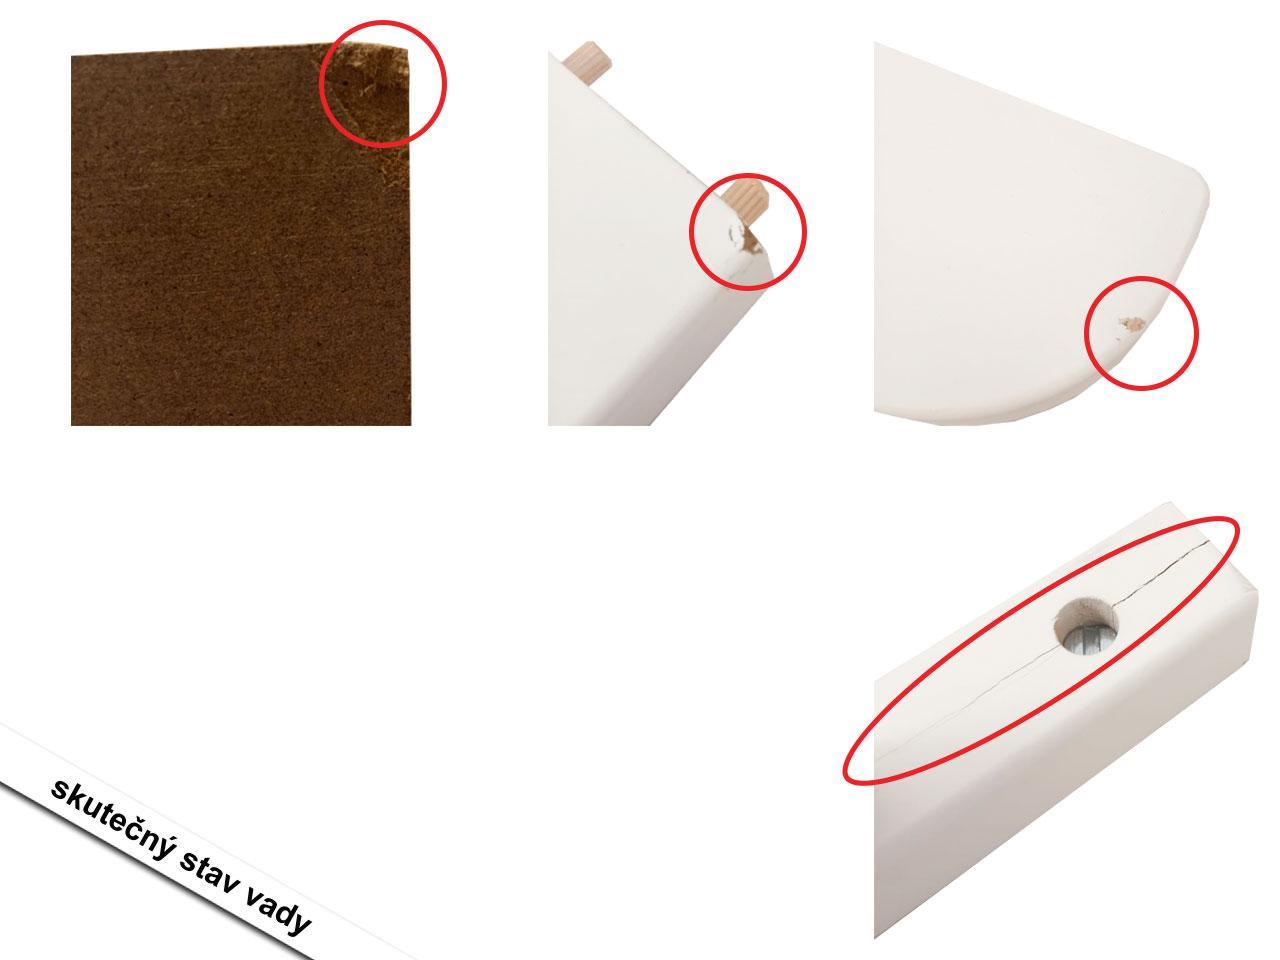 Kolébka s ložní výbavou ROBA, bílá, malé obláčky, růžová